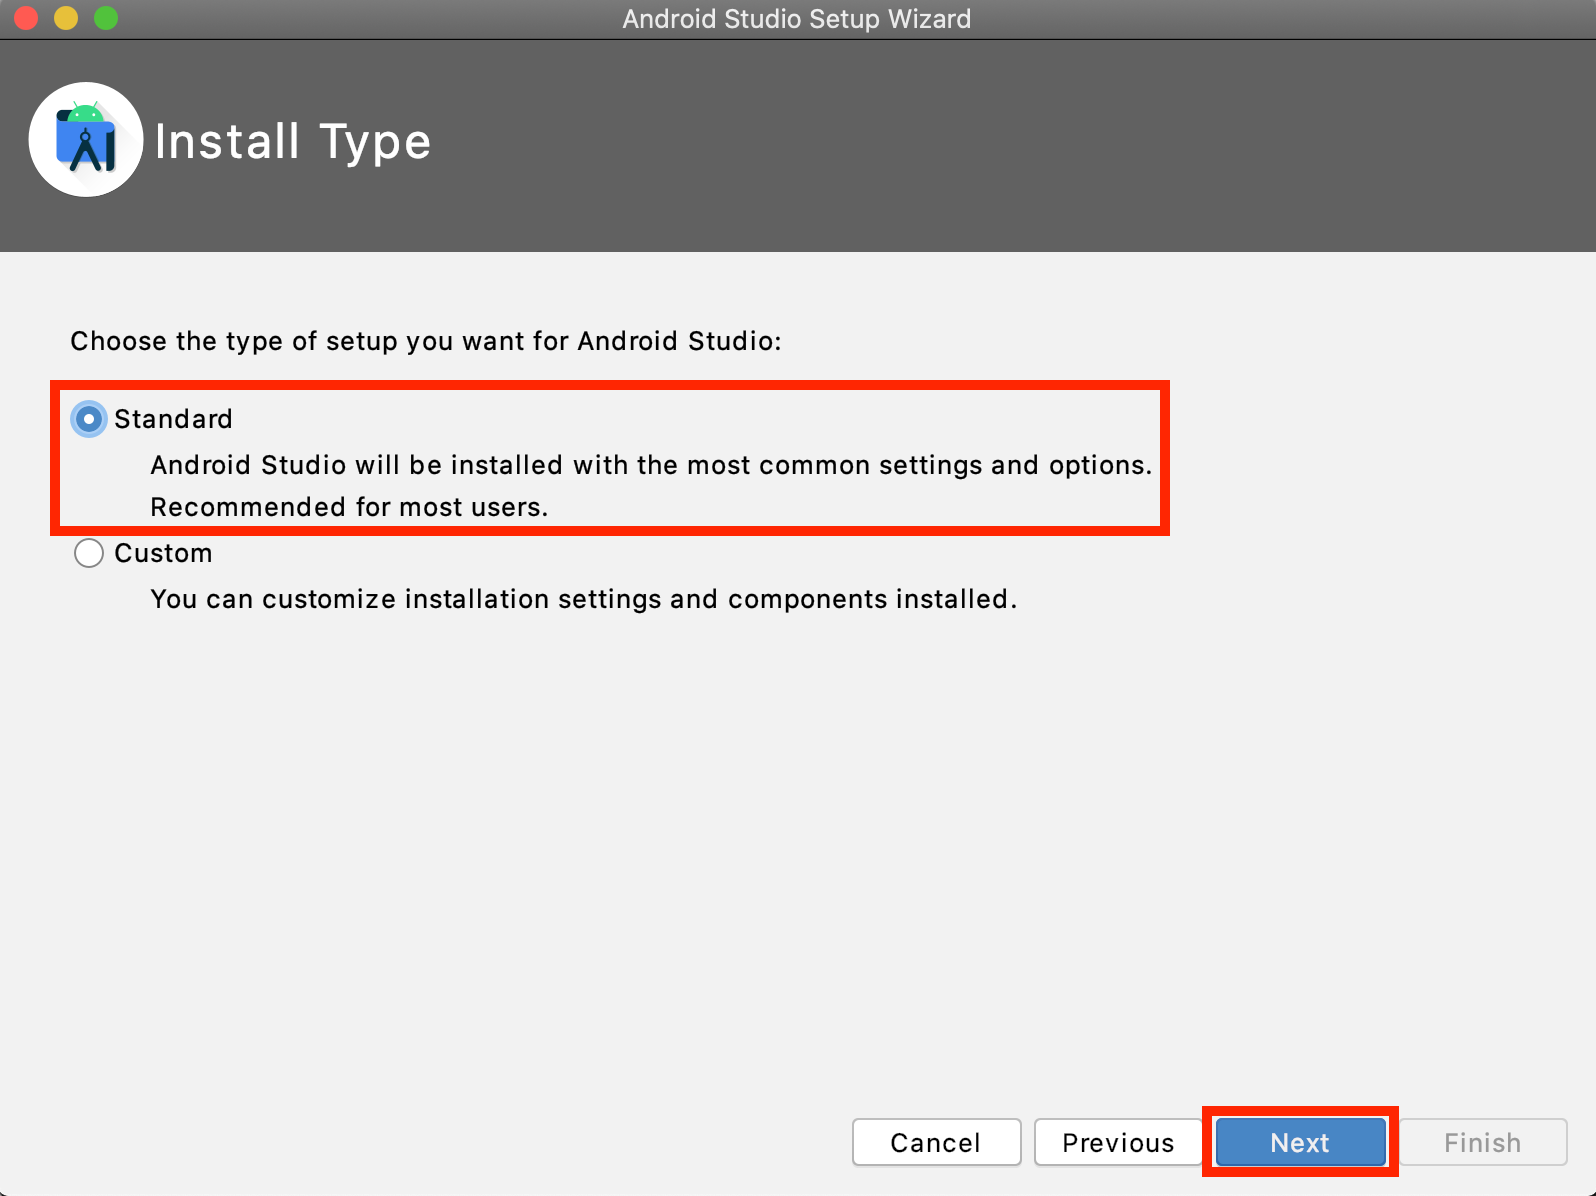 Android StudioのInstall Type選択画面